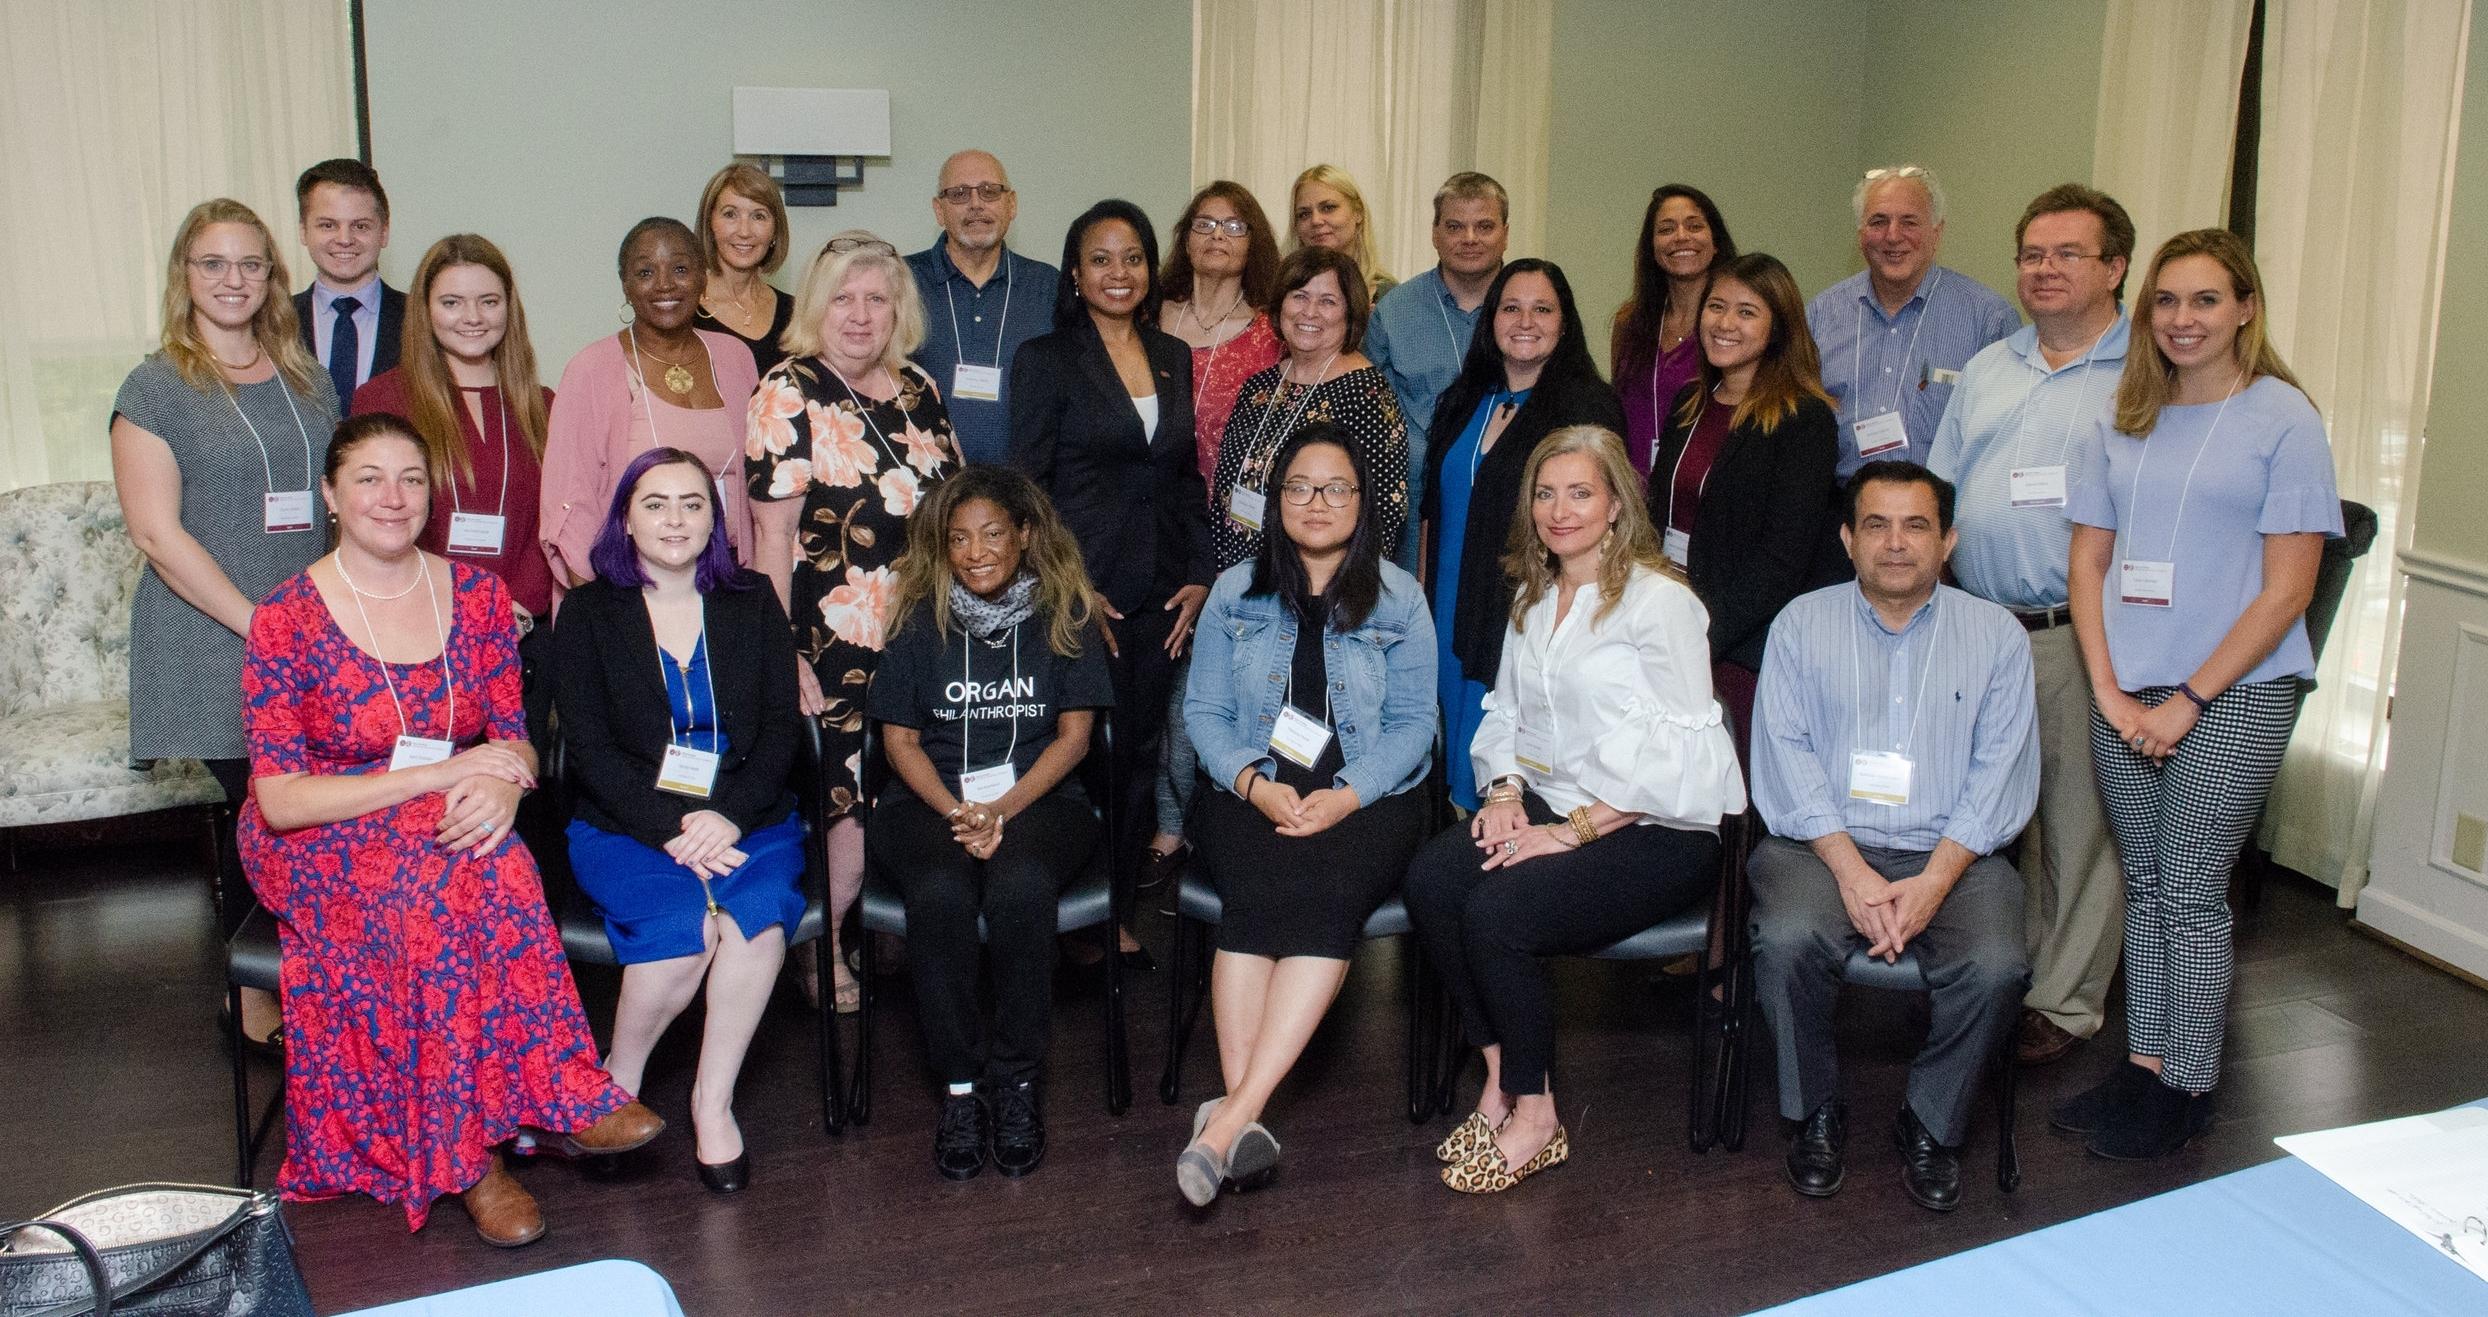 GLI's A3 Advanced Advocacy Academy